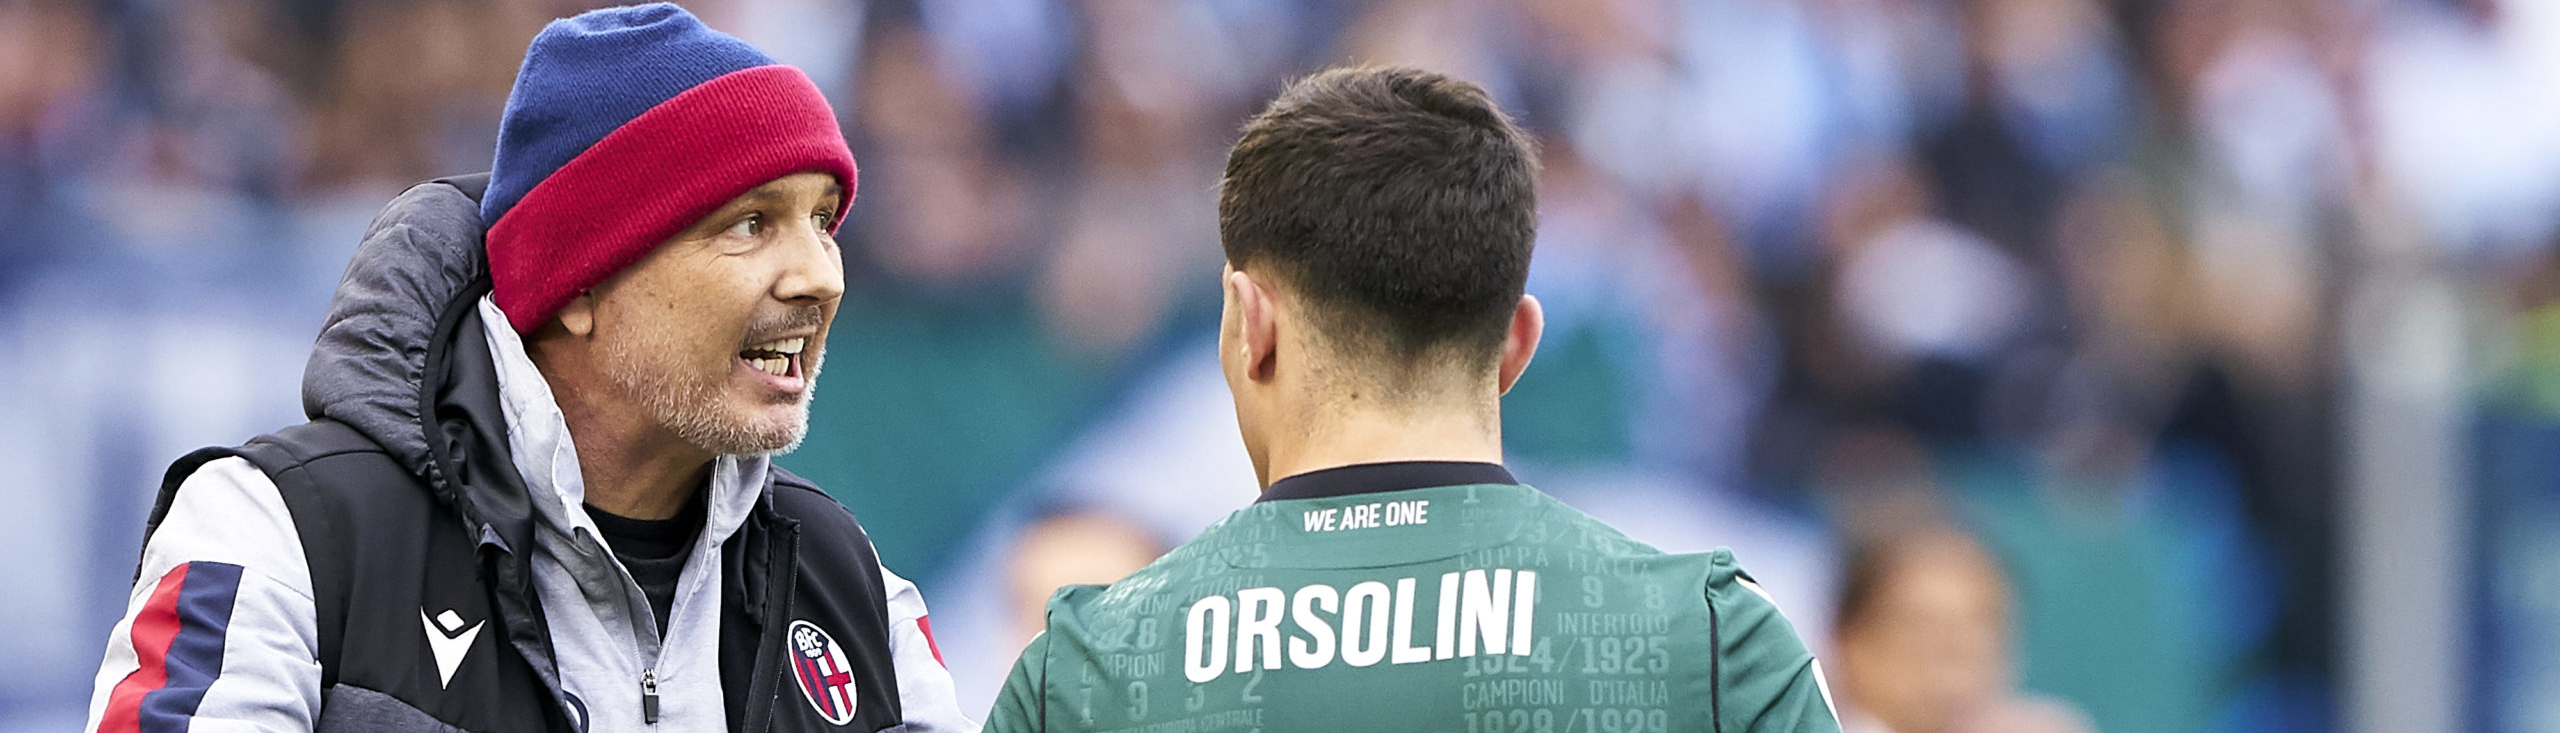 Pronostico Bologna-Juventus, Mihajlovic pensa al tridente per sorprendere i bianconeri